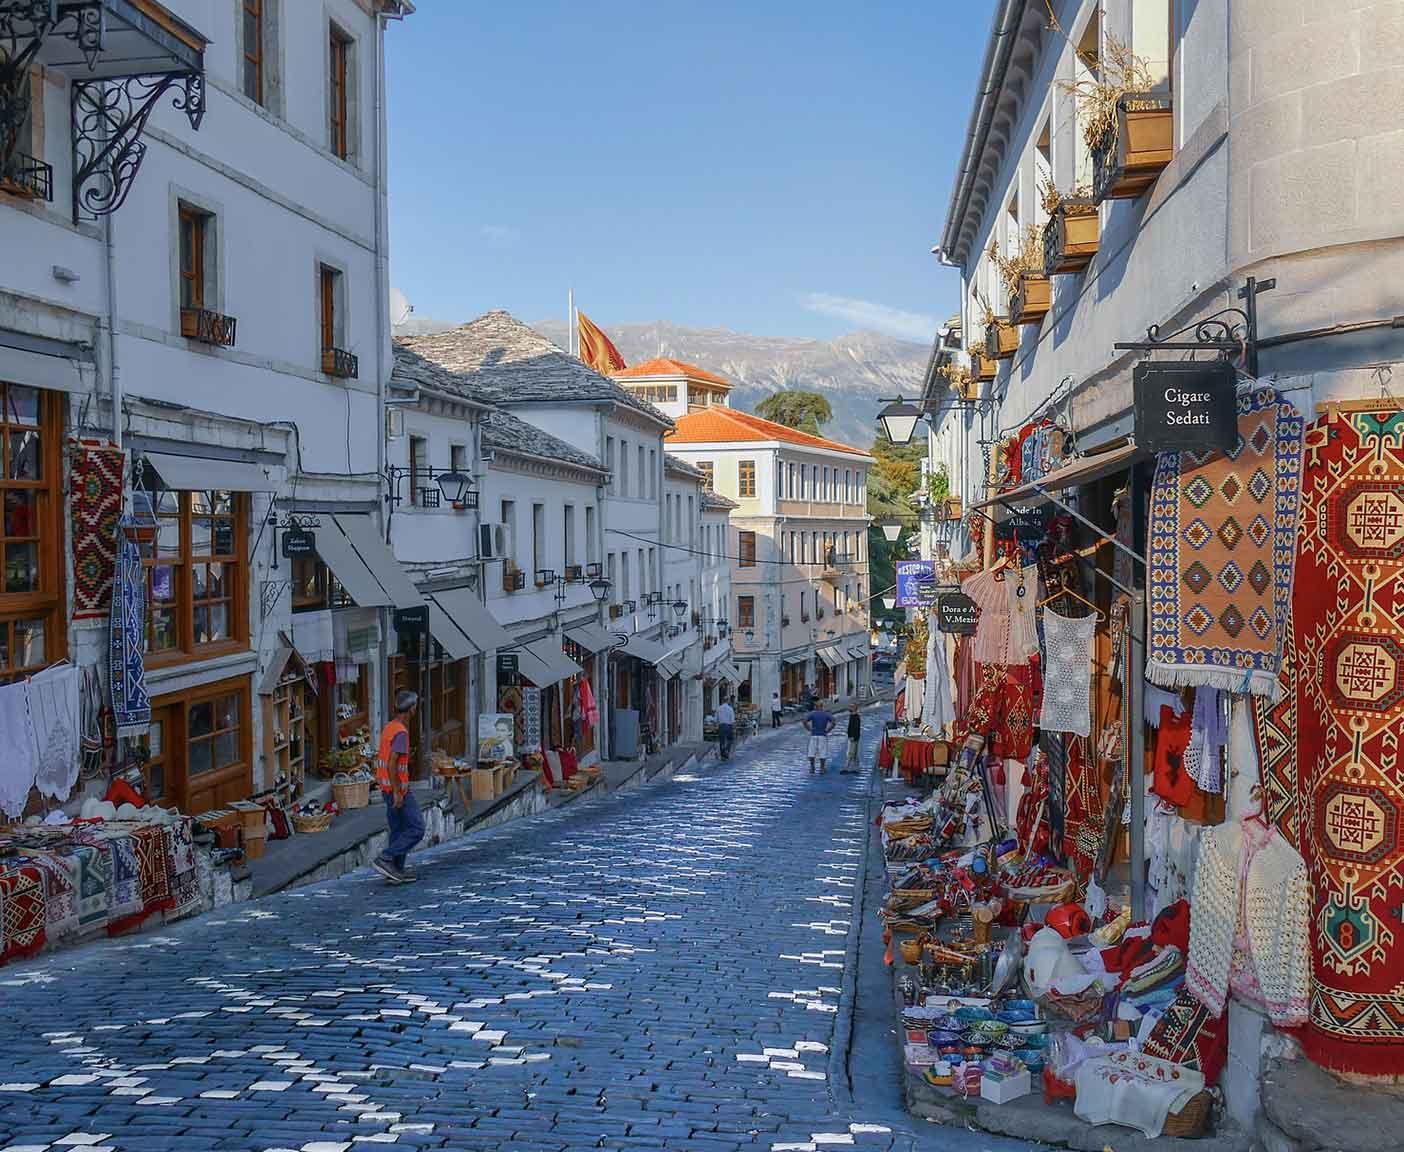 Albanien-wohnmobil-mieten-womo-reisebericht-balkan-erfahrungen